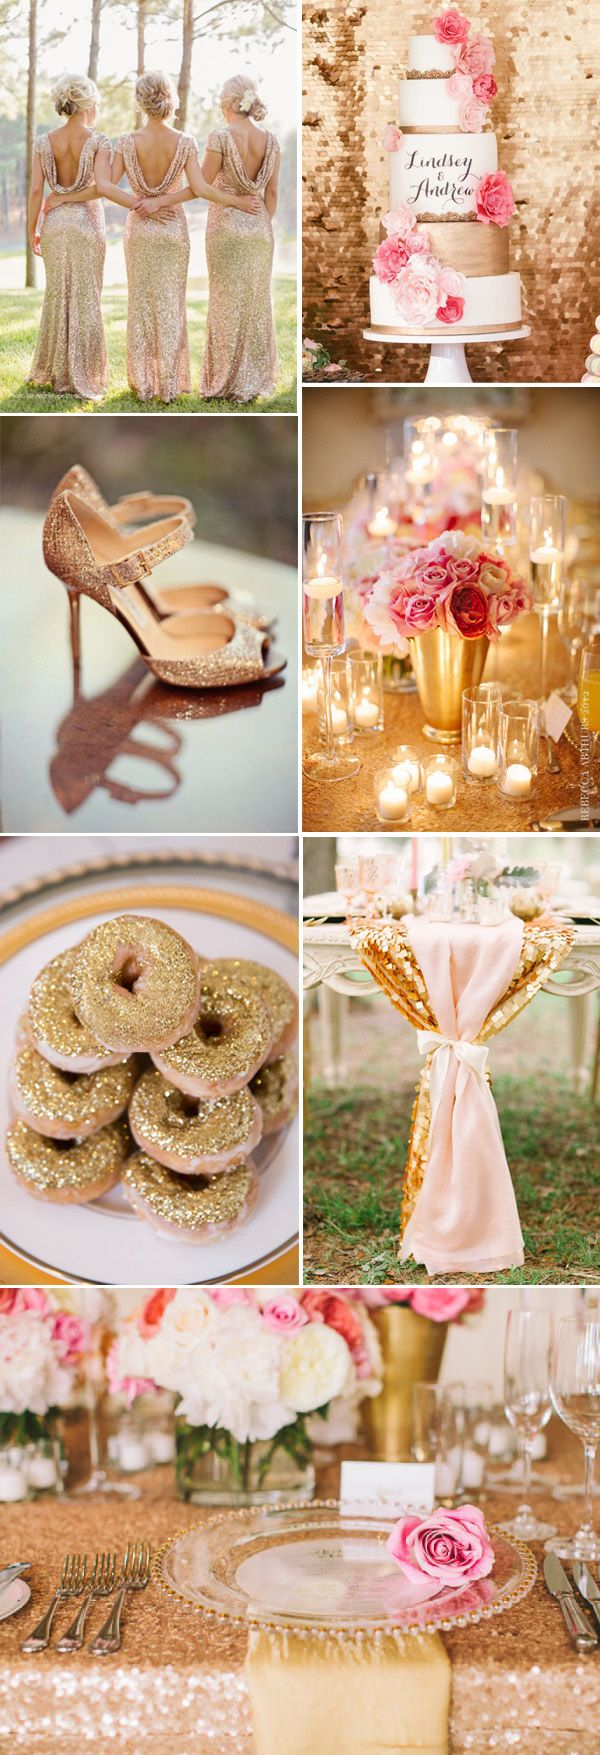 Chic Glittery Gold & Pink Wedding Idea